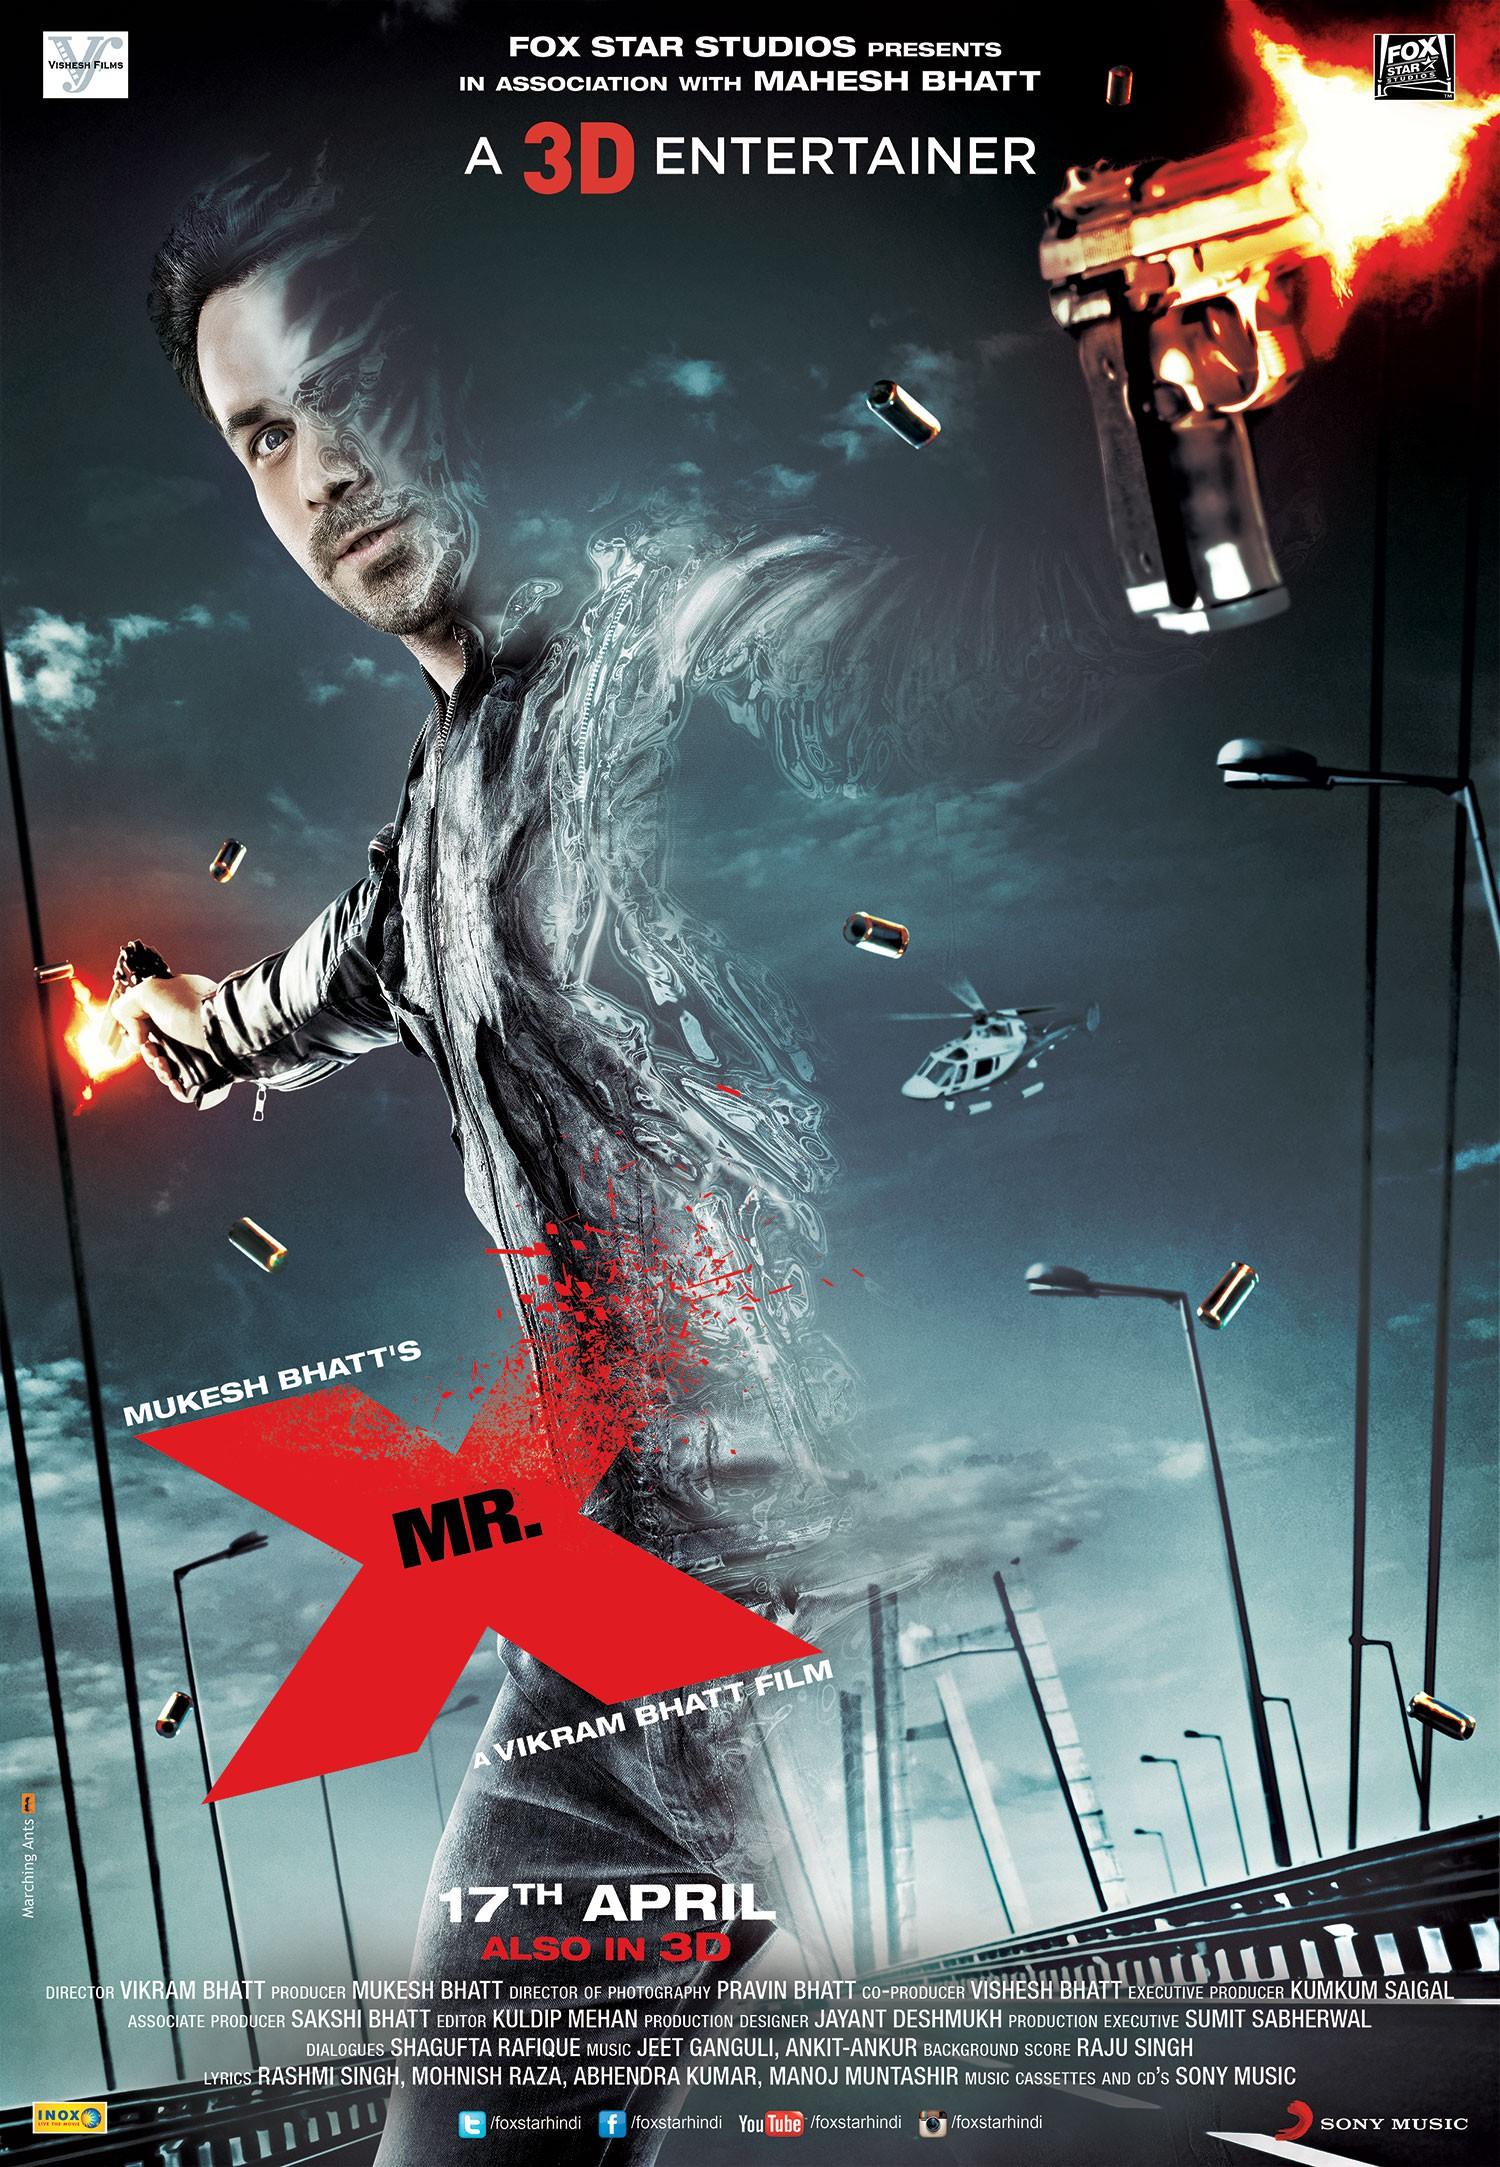 Mr. X (2015) Hindi 720p WEB-DL x265 AAC 750MB